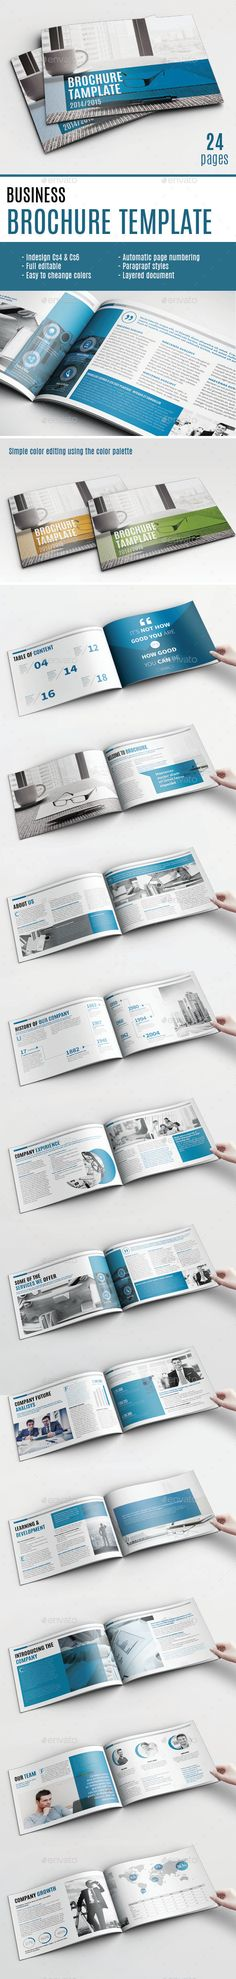 Multipurpose Brochure Template #design Download: http://graphicriver.net/item/multipurpose-brochure-template/10339728?ref=ksioks